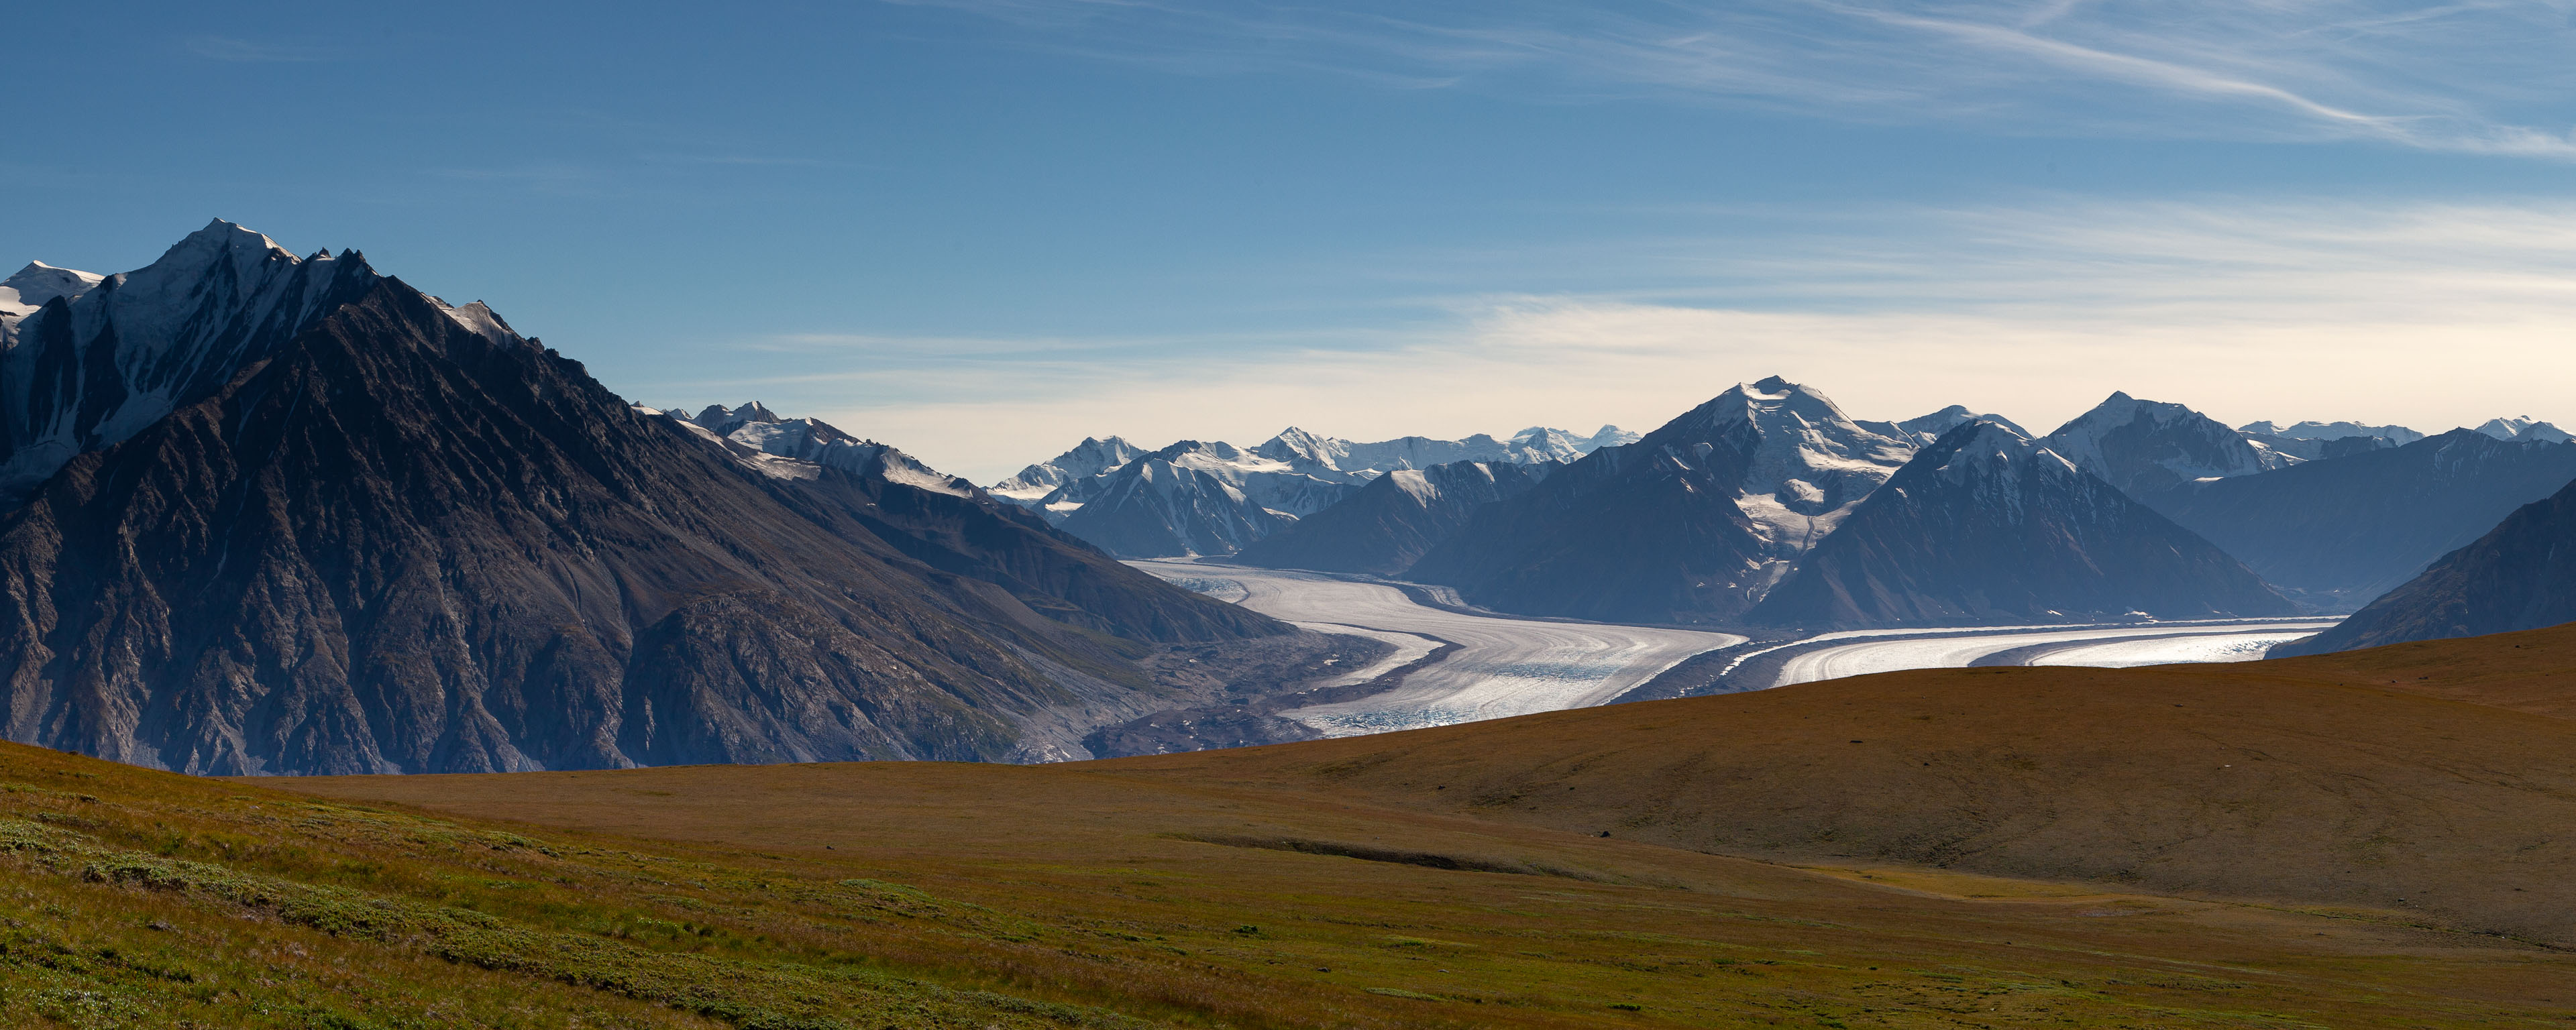 Kaskawulsh glacier, Kluane National Park